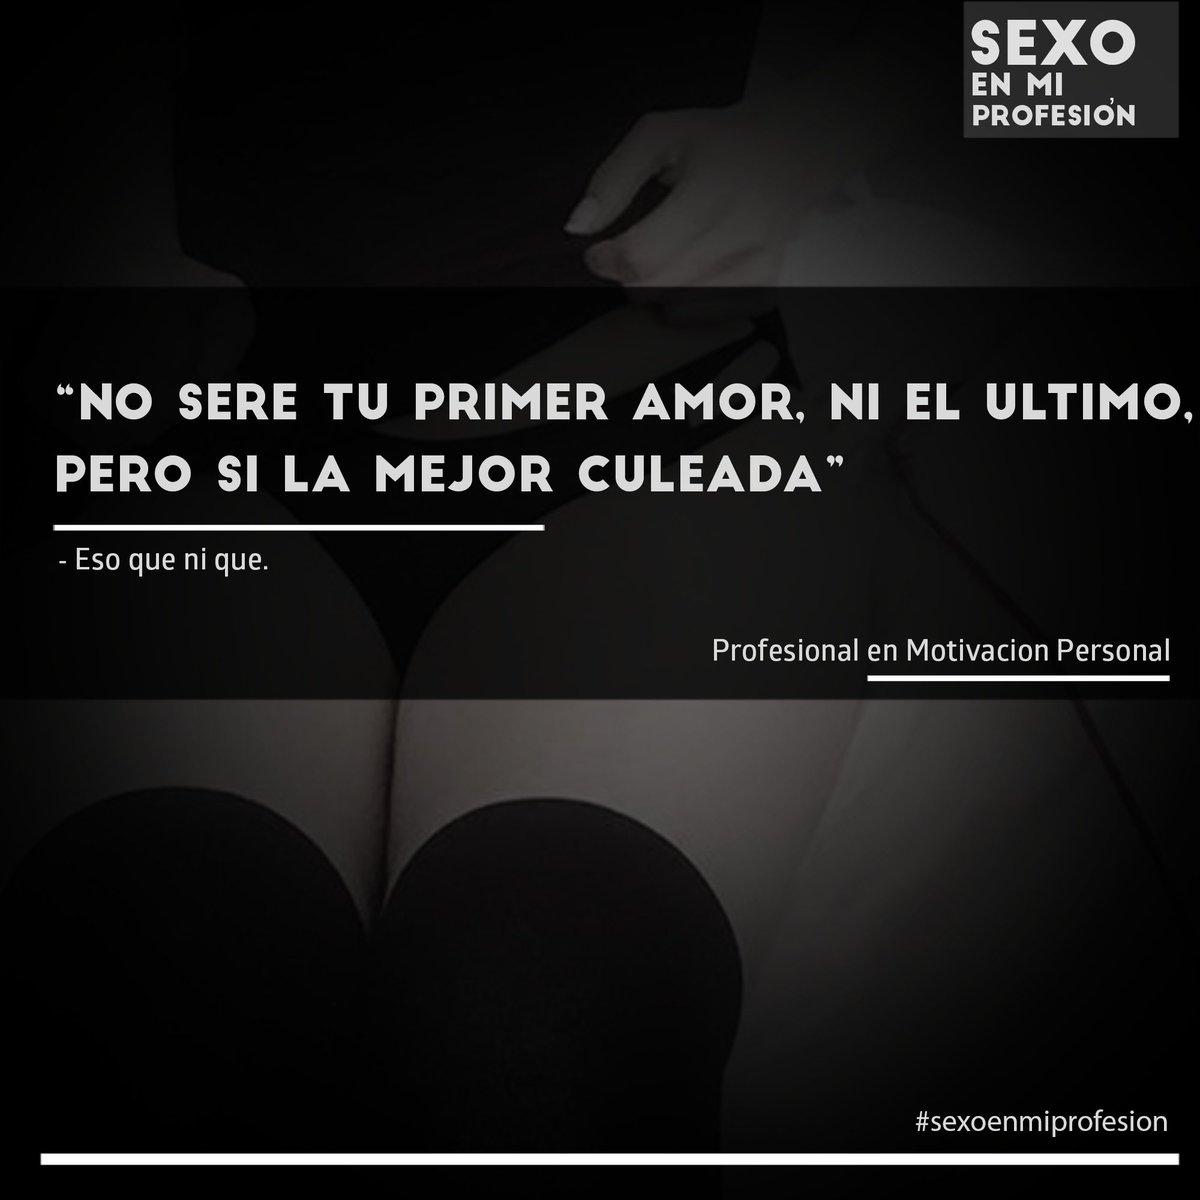 Sexoenmiprofesion בטוויטר Bienvenid A Sexo En Mi